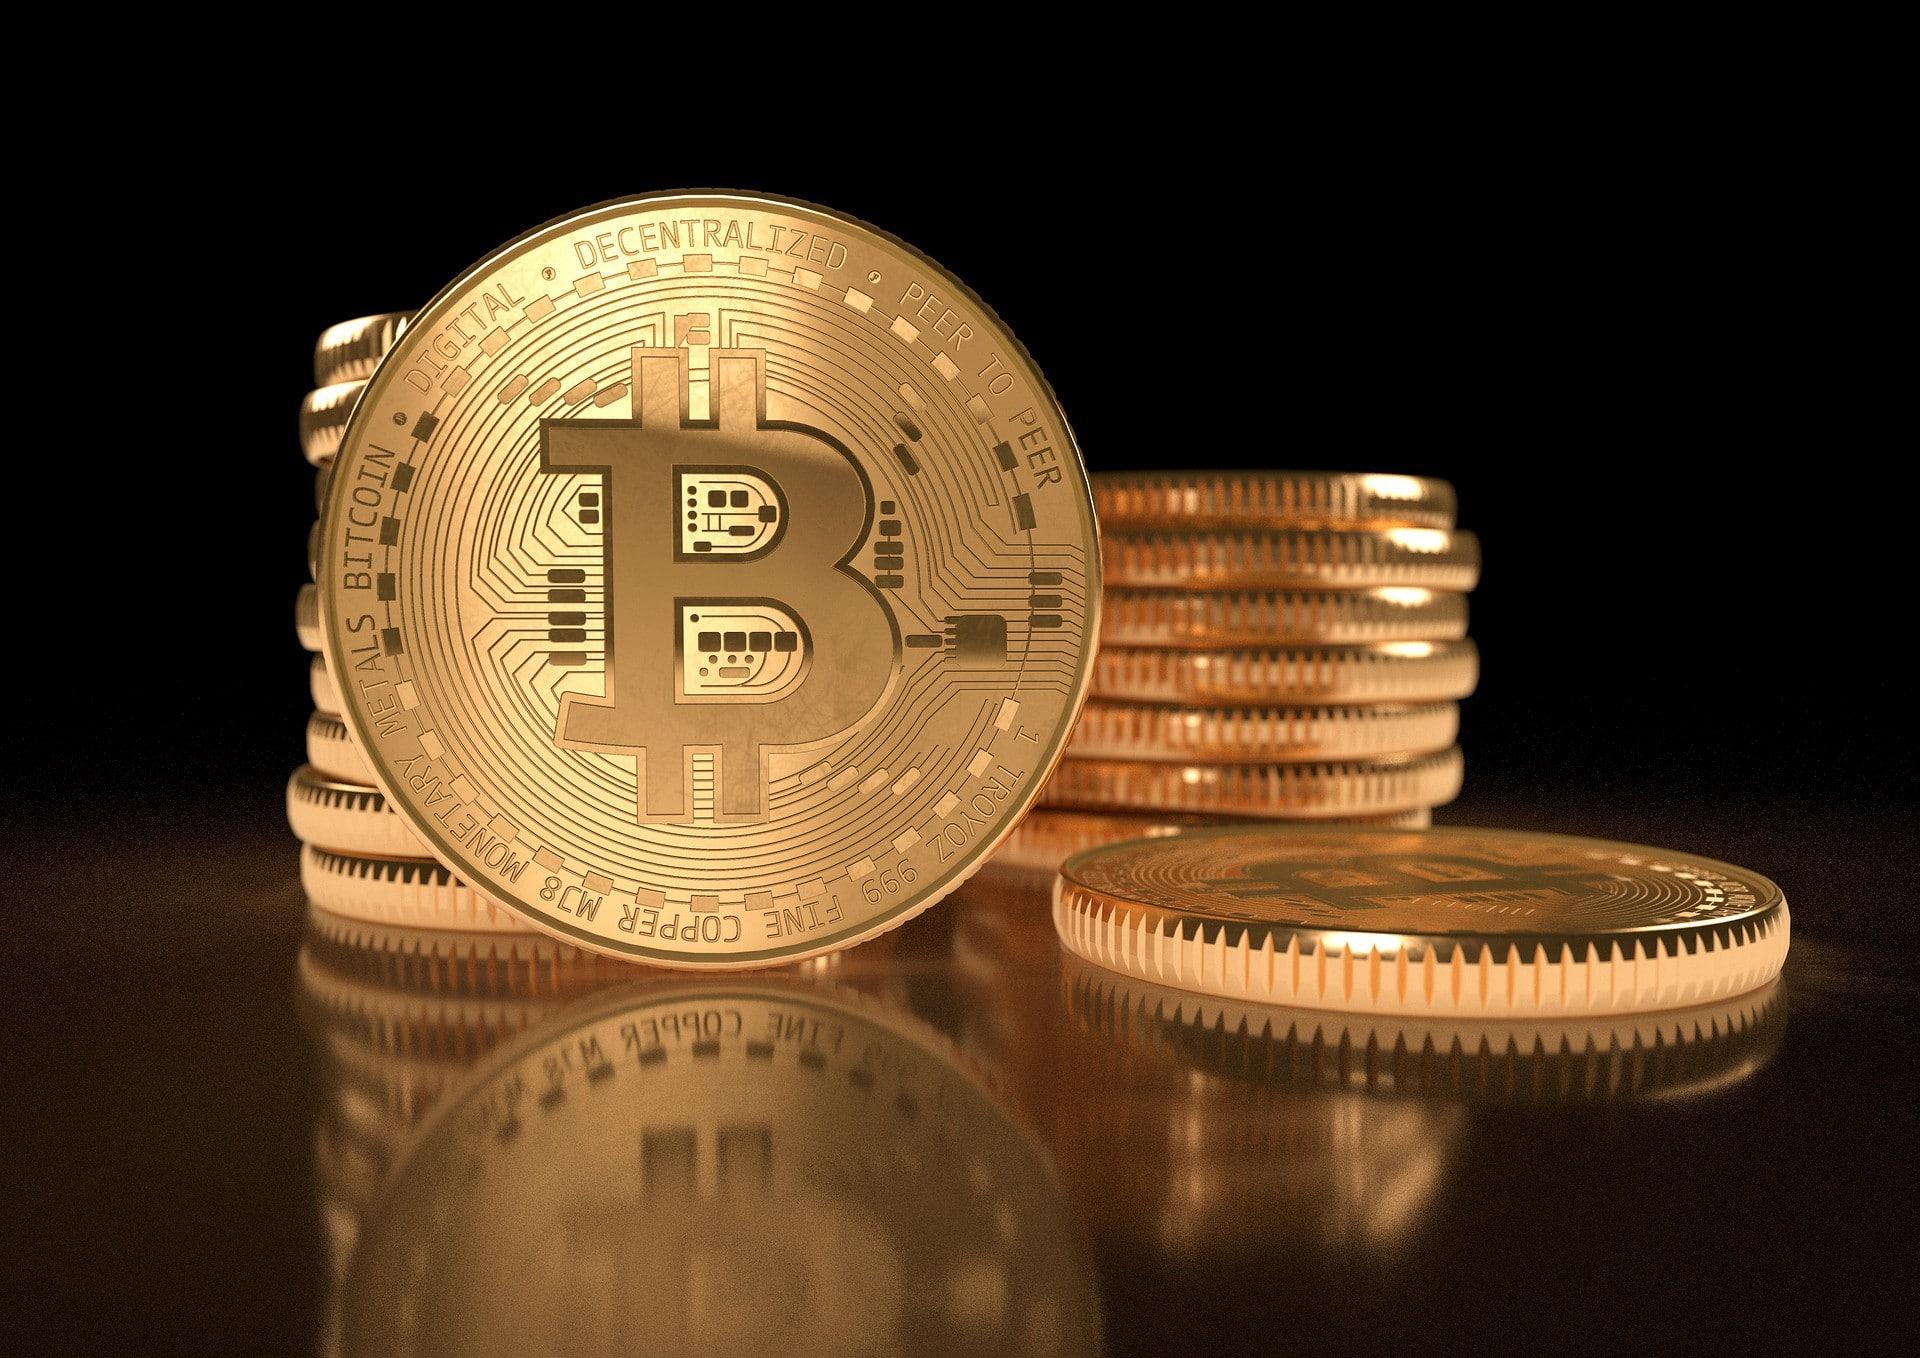 Drawbacks Of Cryptocurrencies